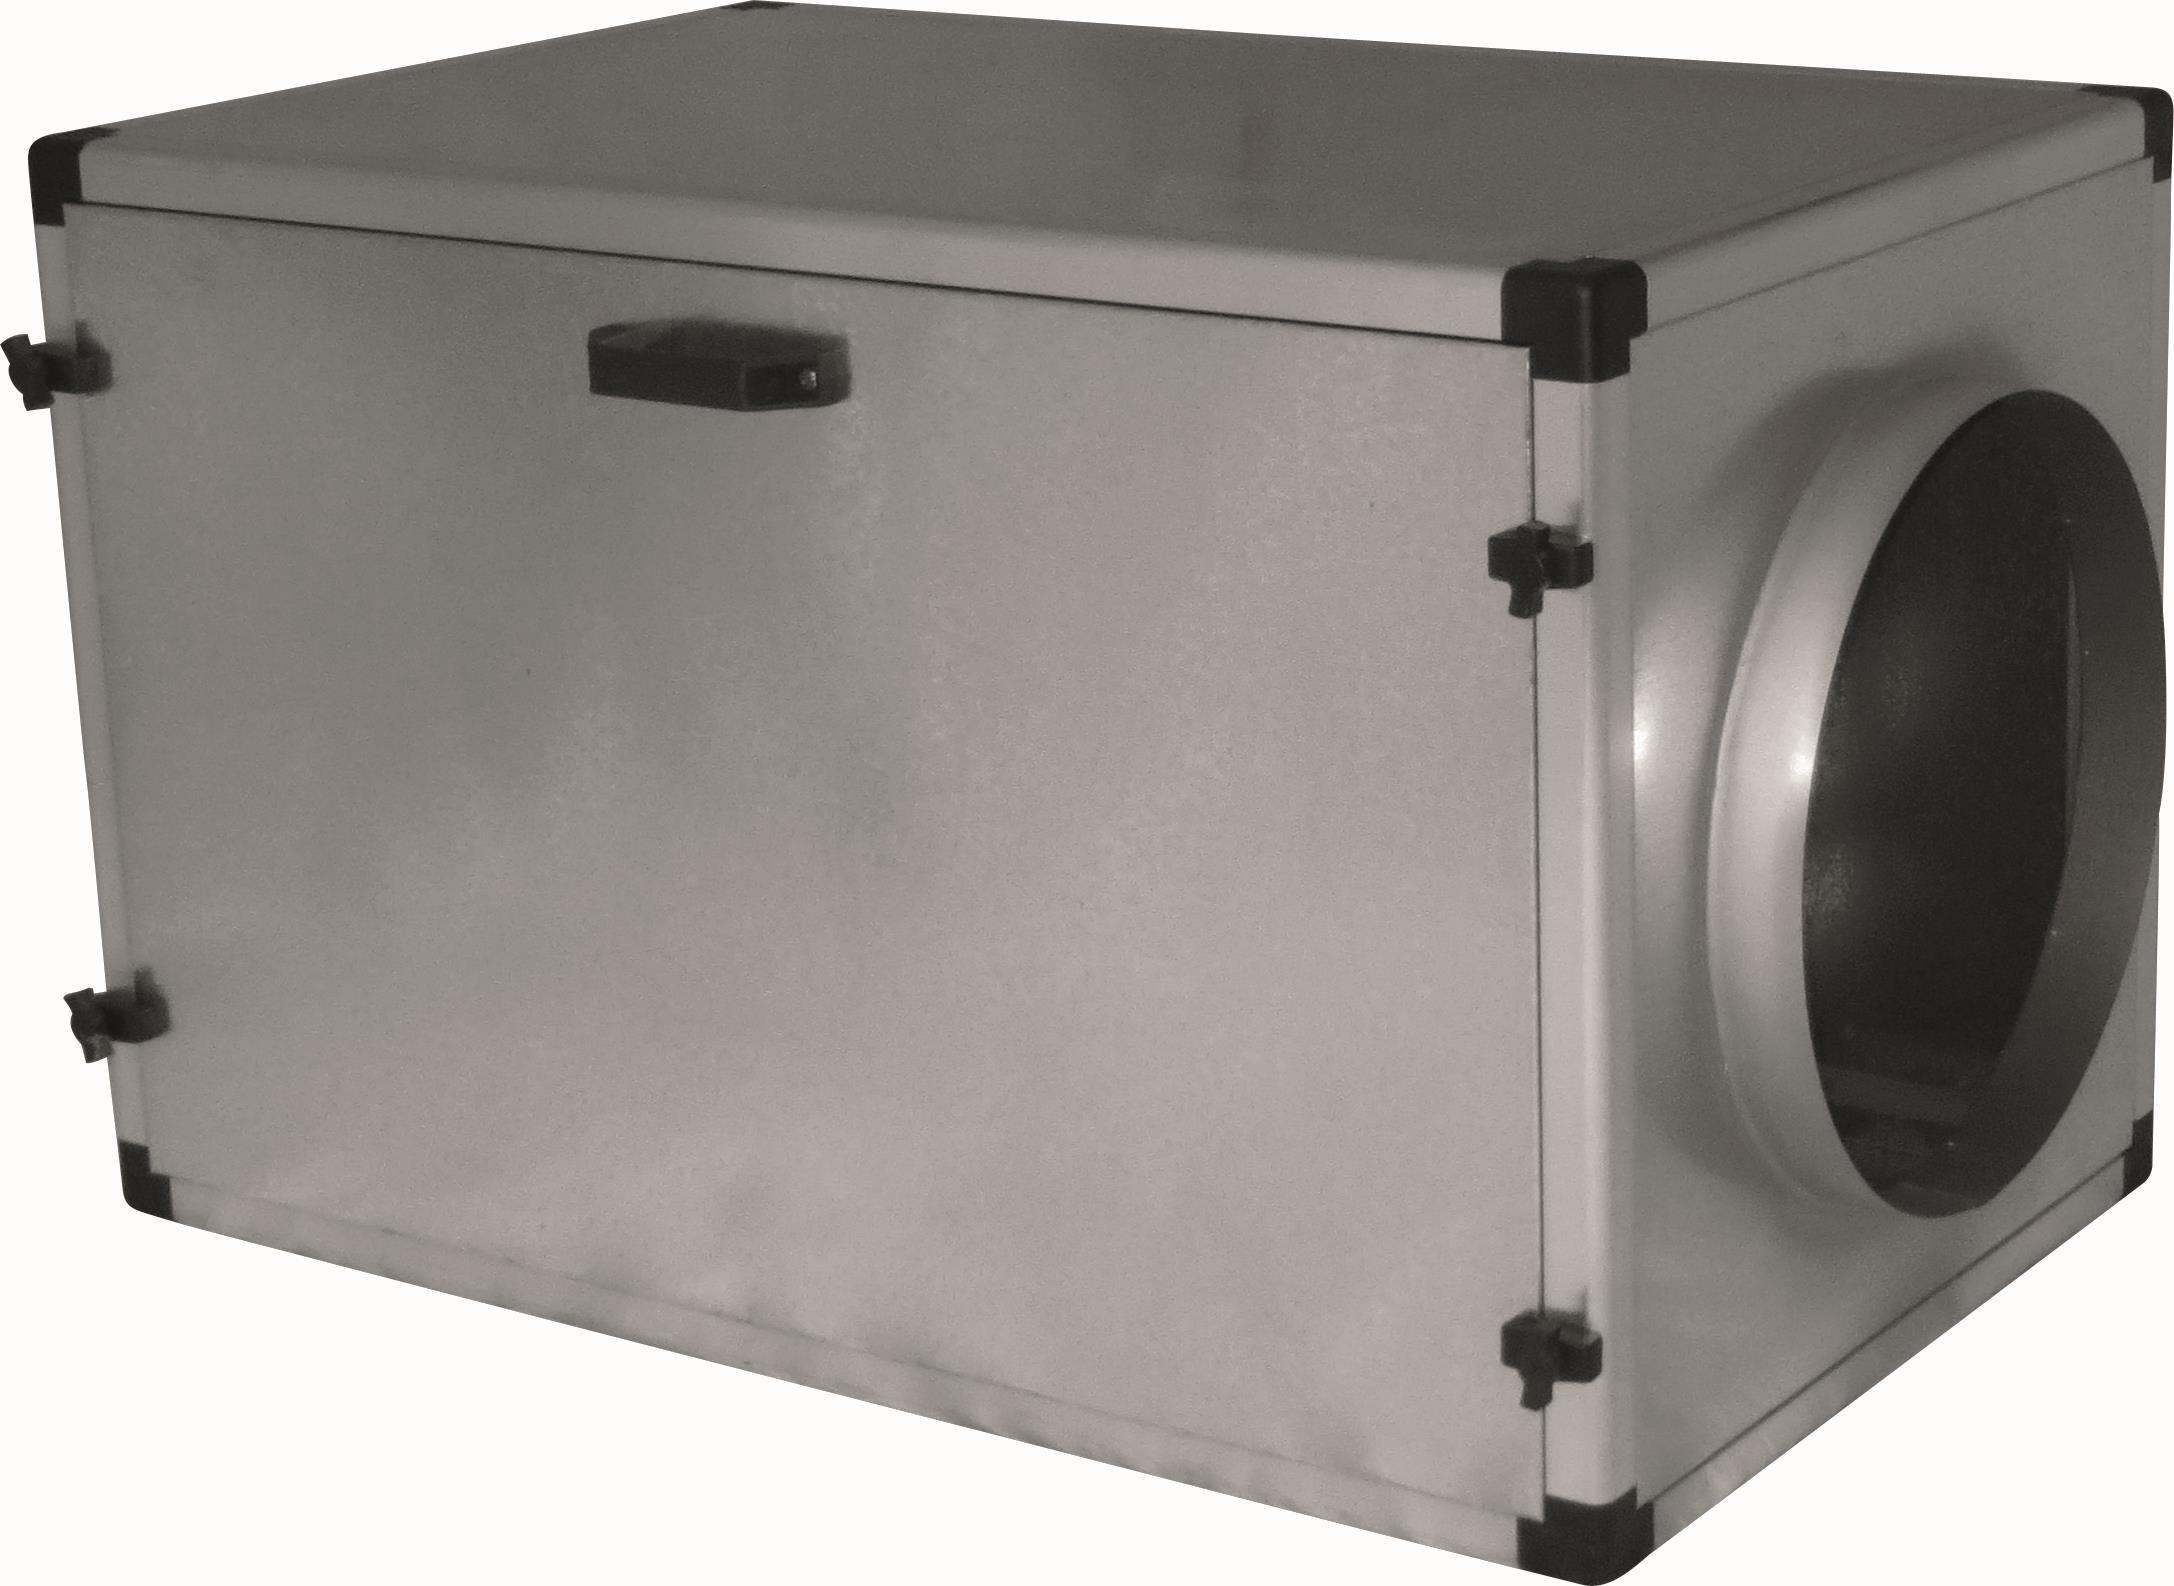 1 stück aktivkohlepatrone aktivkohlefilter filter zum nachkauf